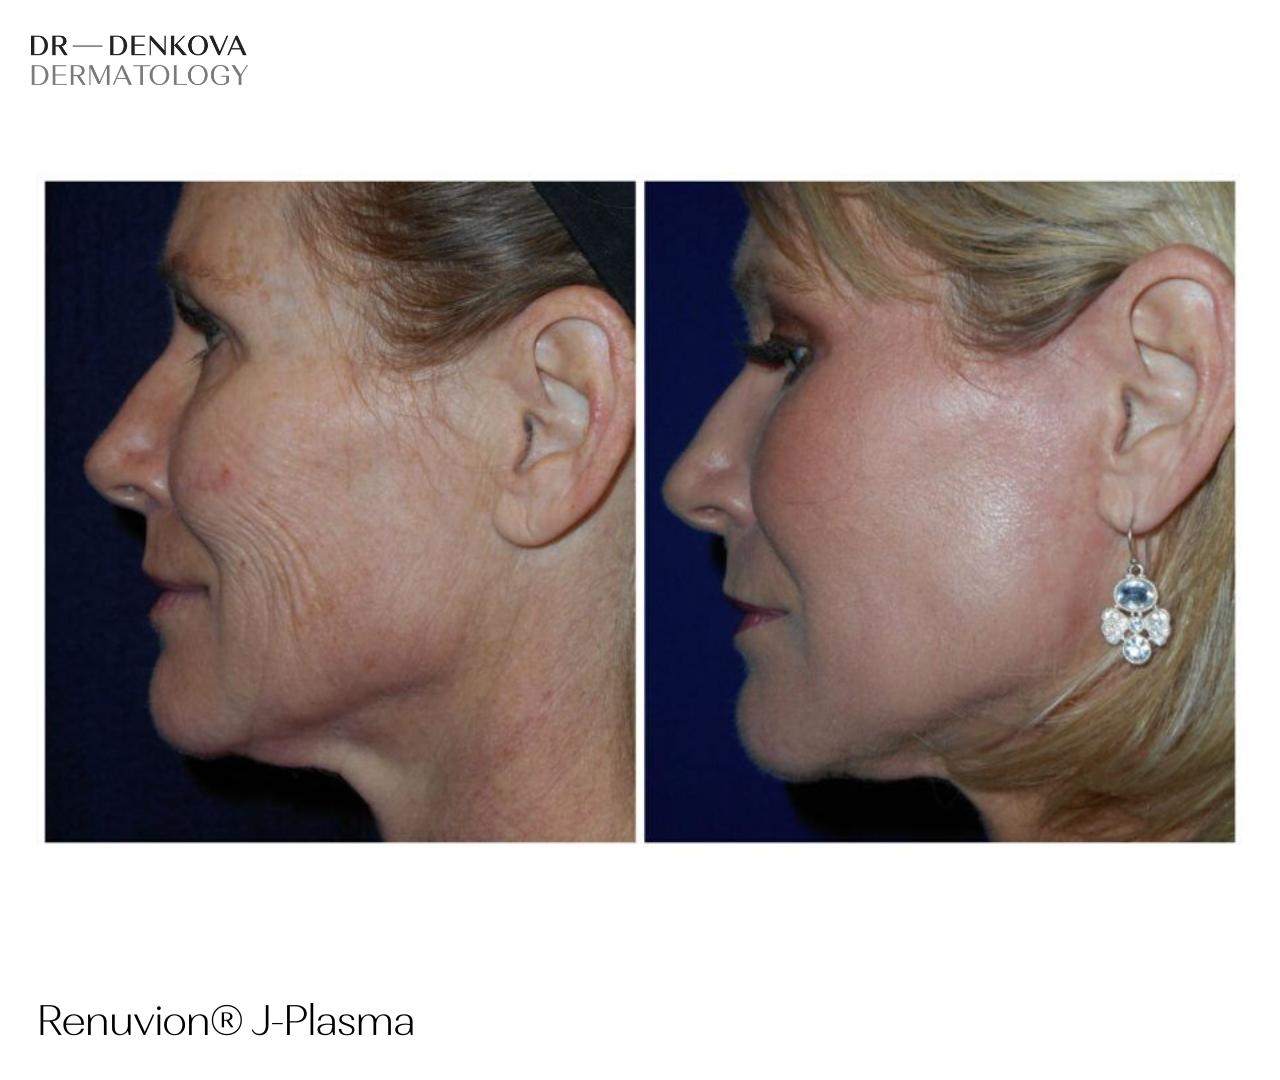 Renuvion J-Plasma - преди и след - DR—DENKOVA DERMATOLOGY